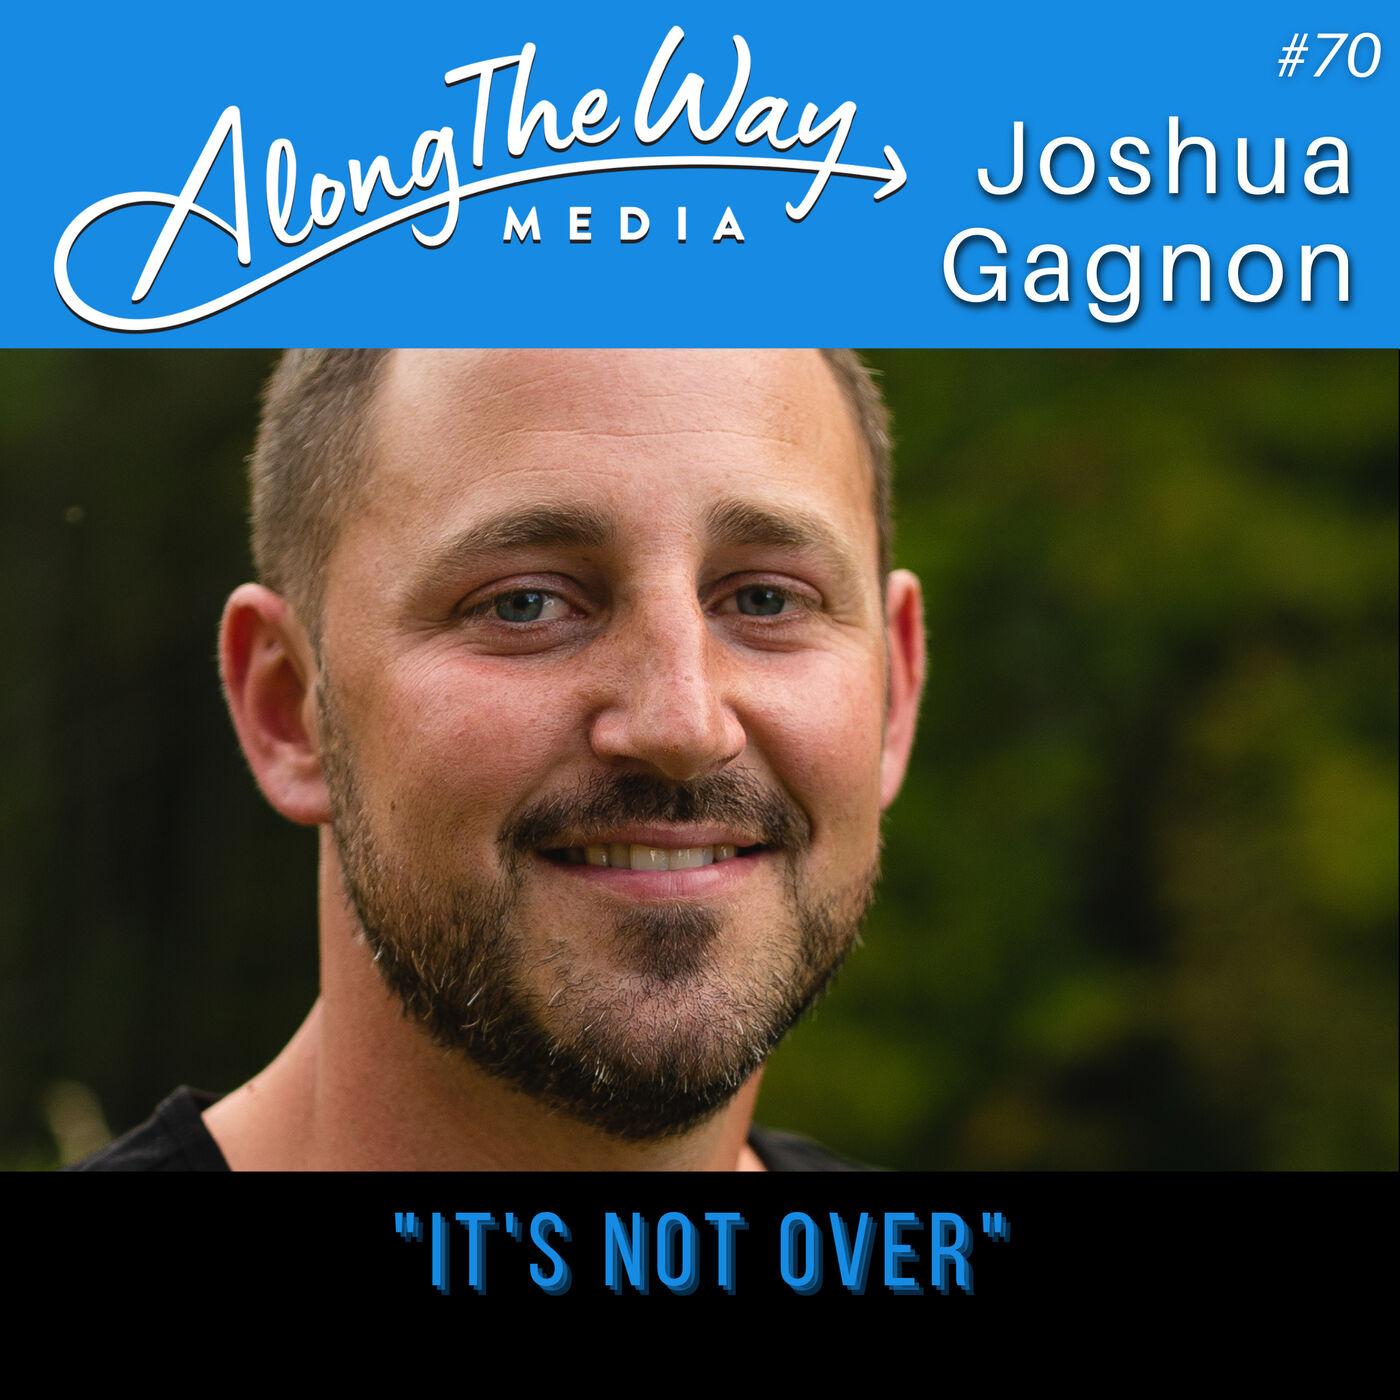 """It's Not Over"" - Josh Gagnon AlongTheWay 70"